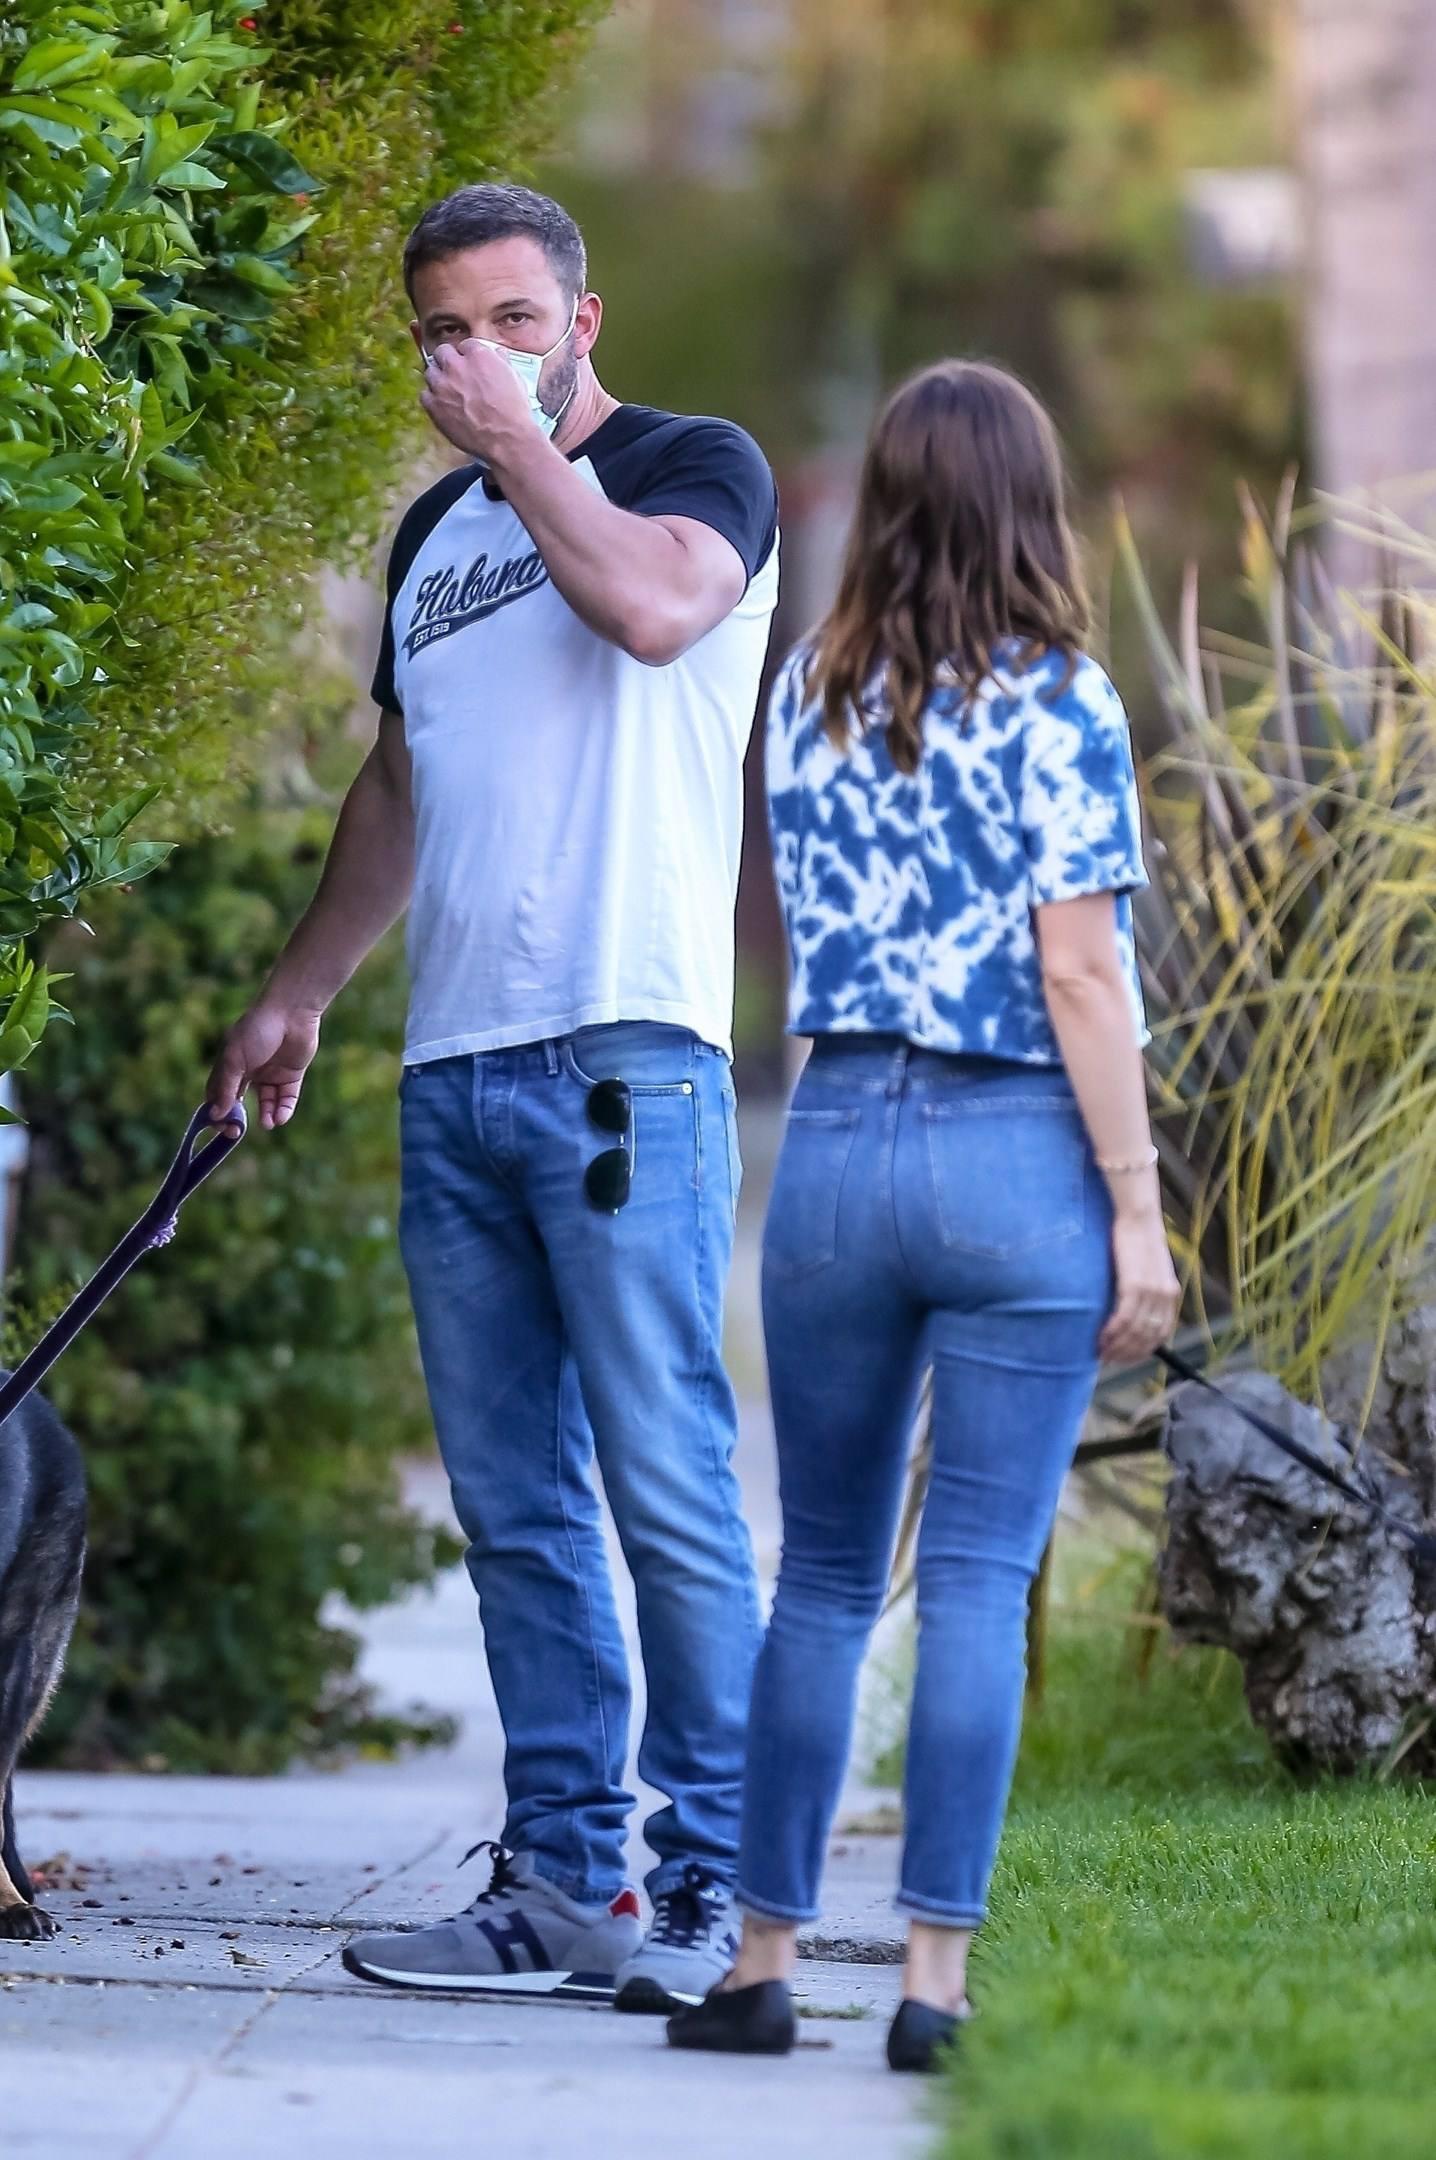 Ana De Armas Hot Ass In Jeans